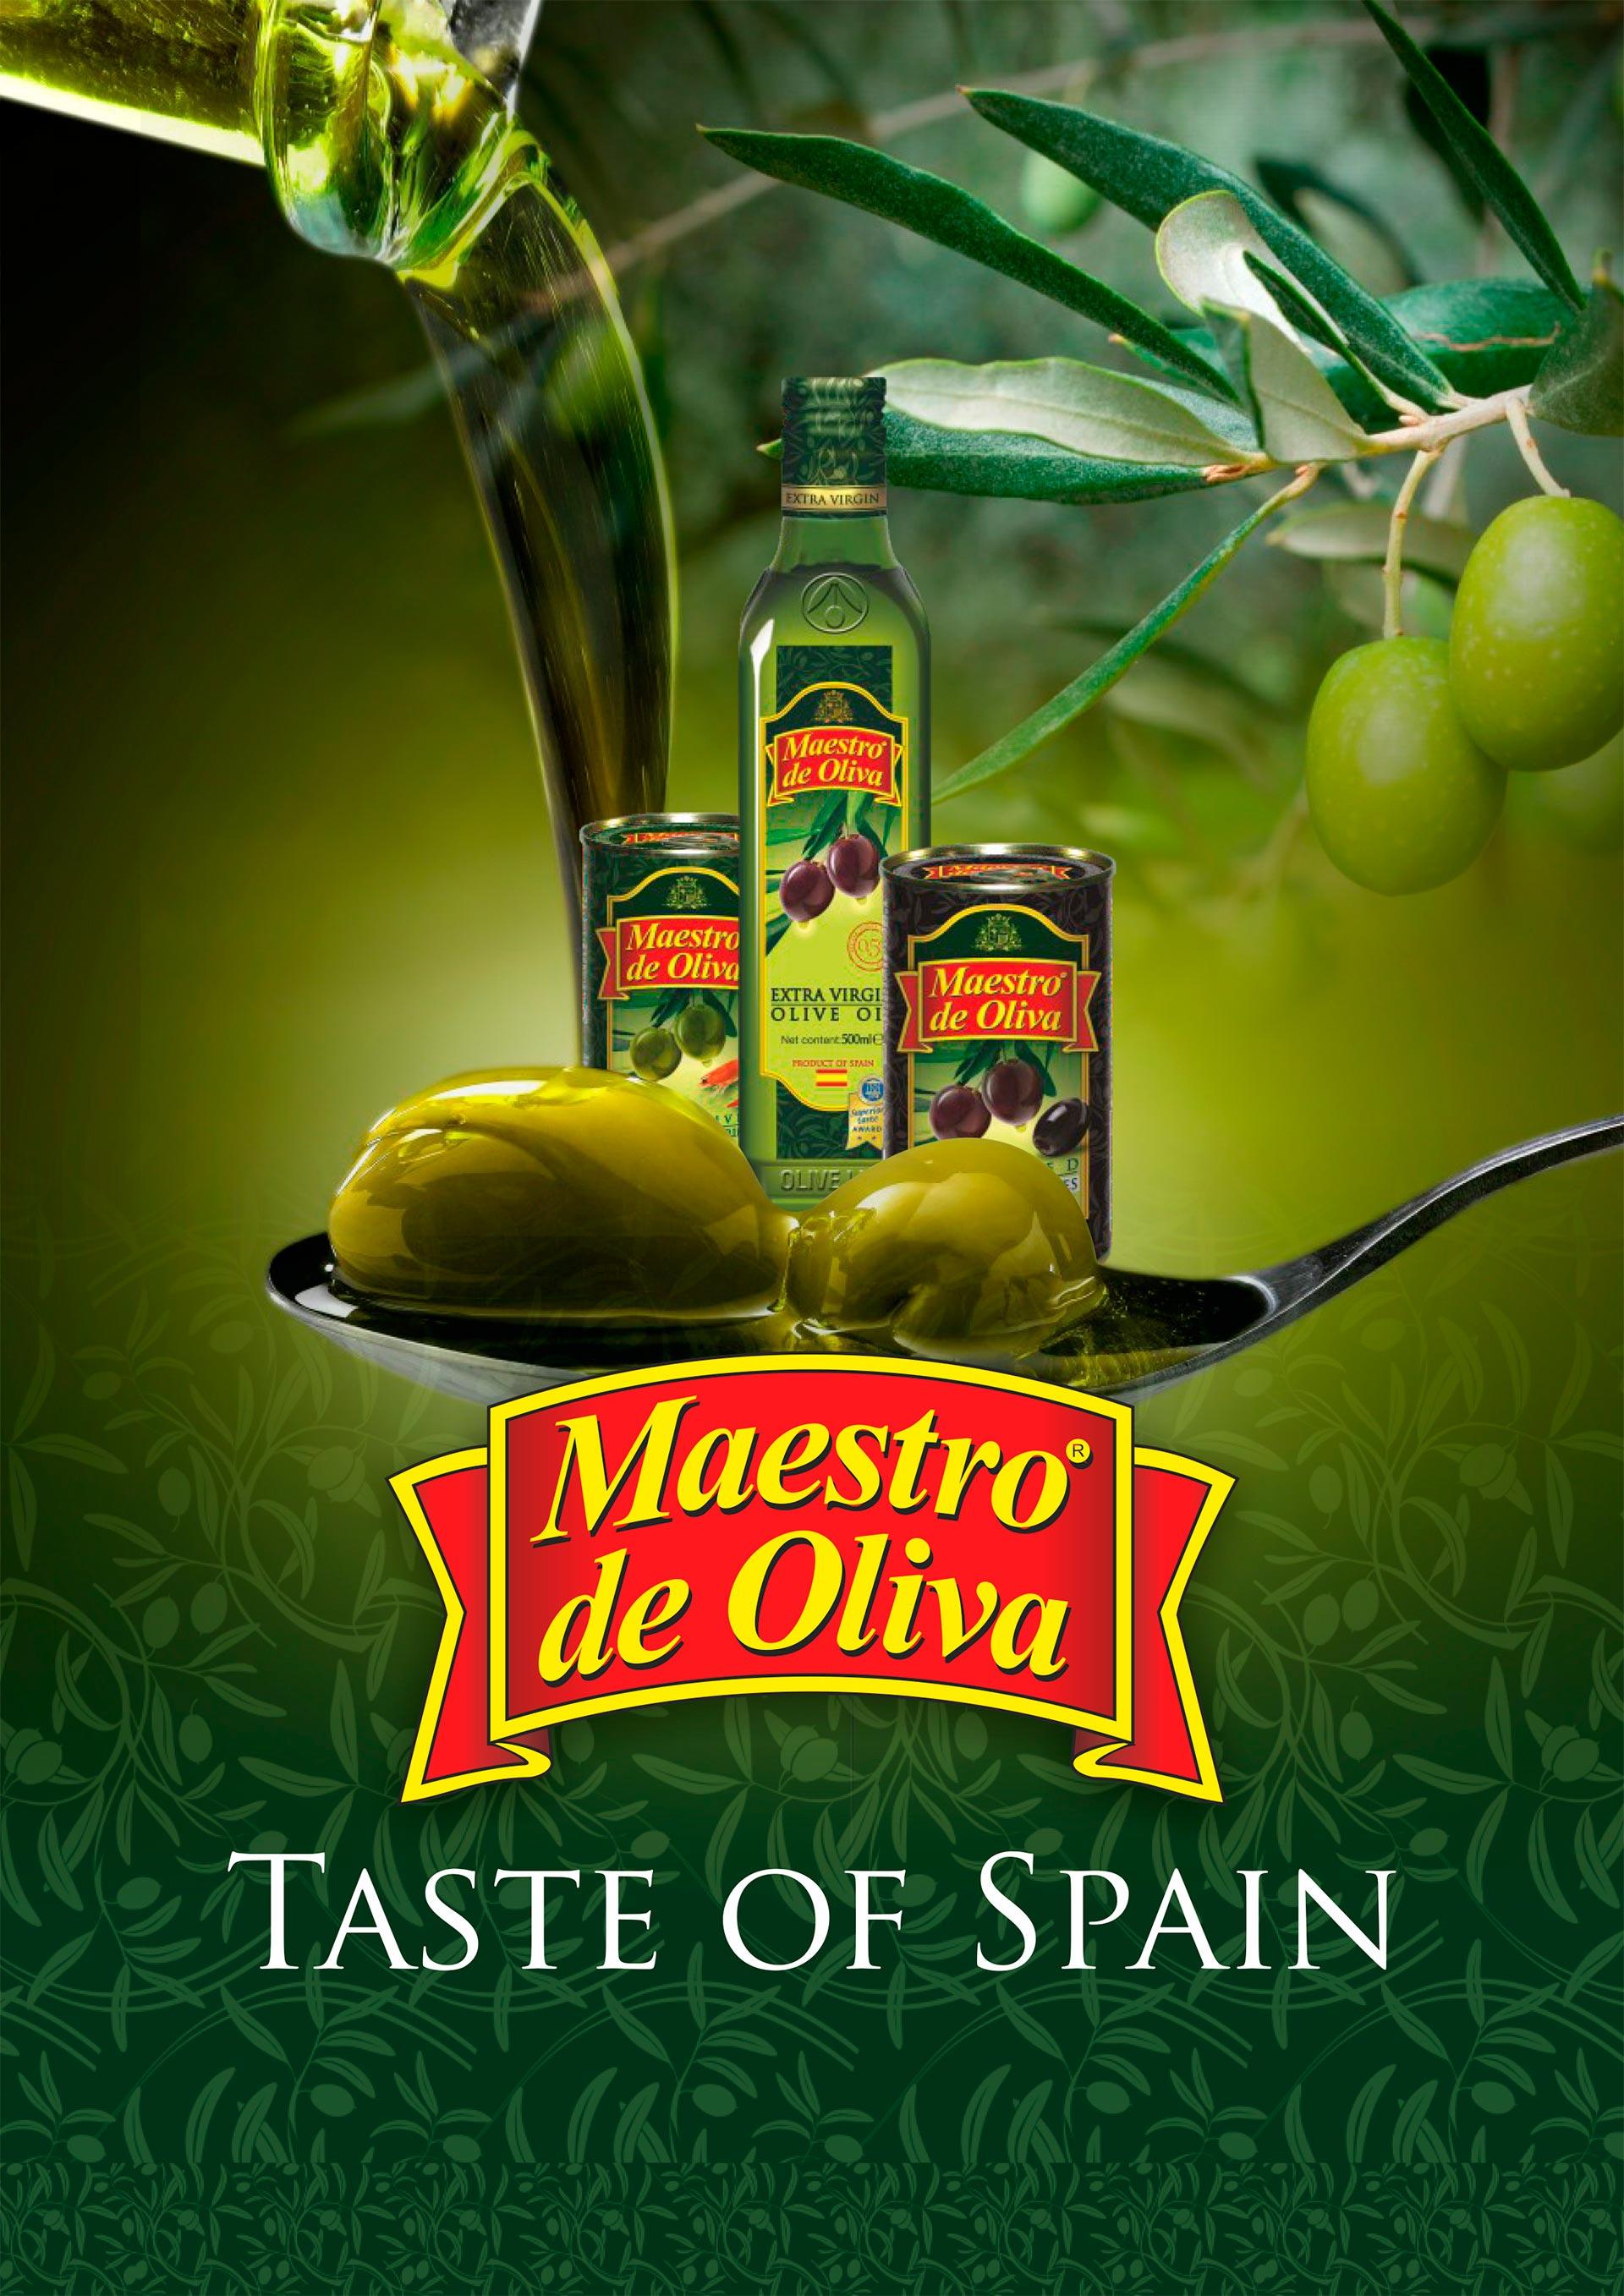 Catalogue Maestro de Oliva 1